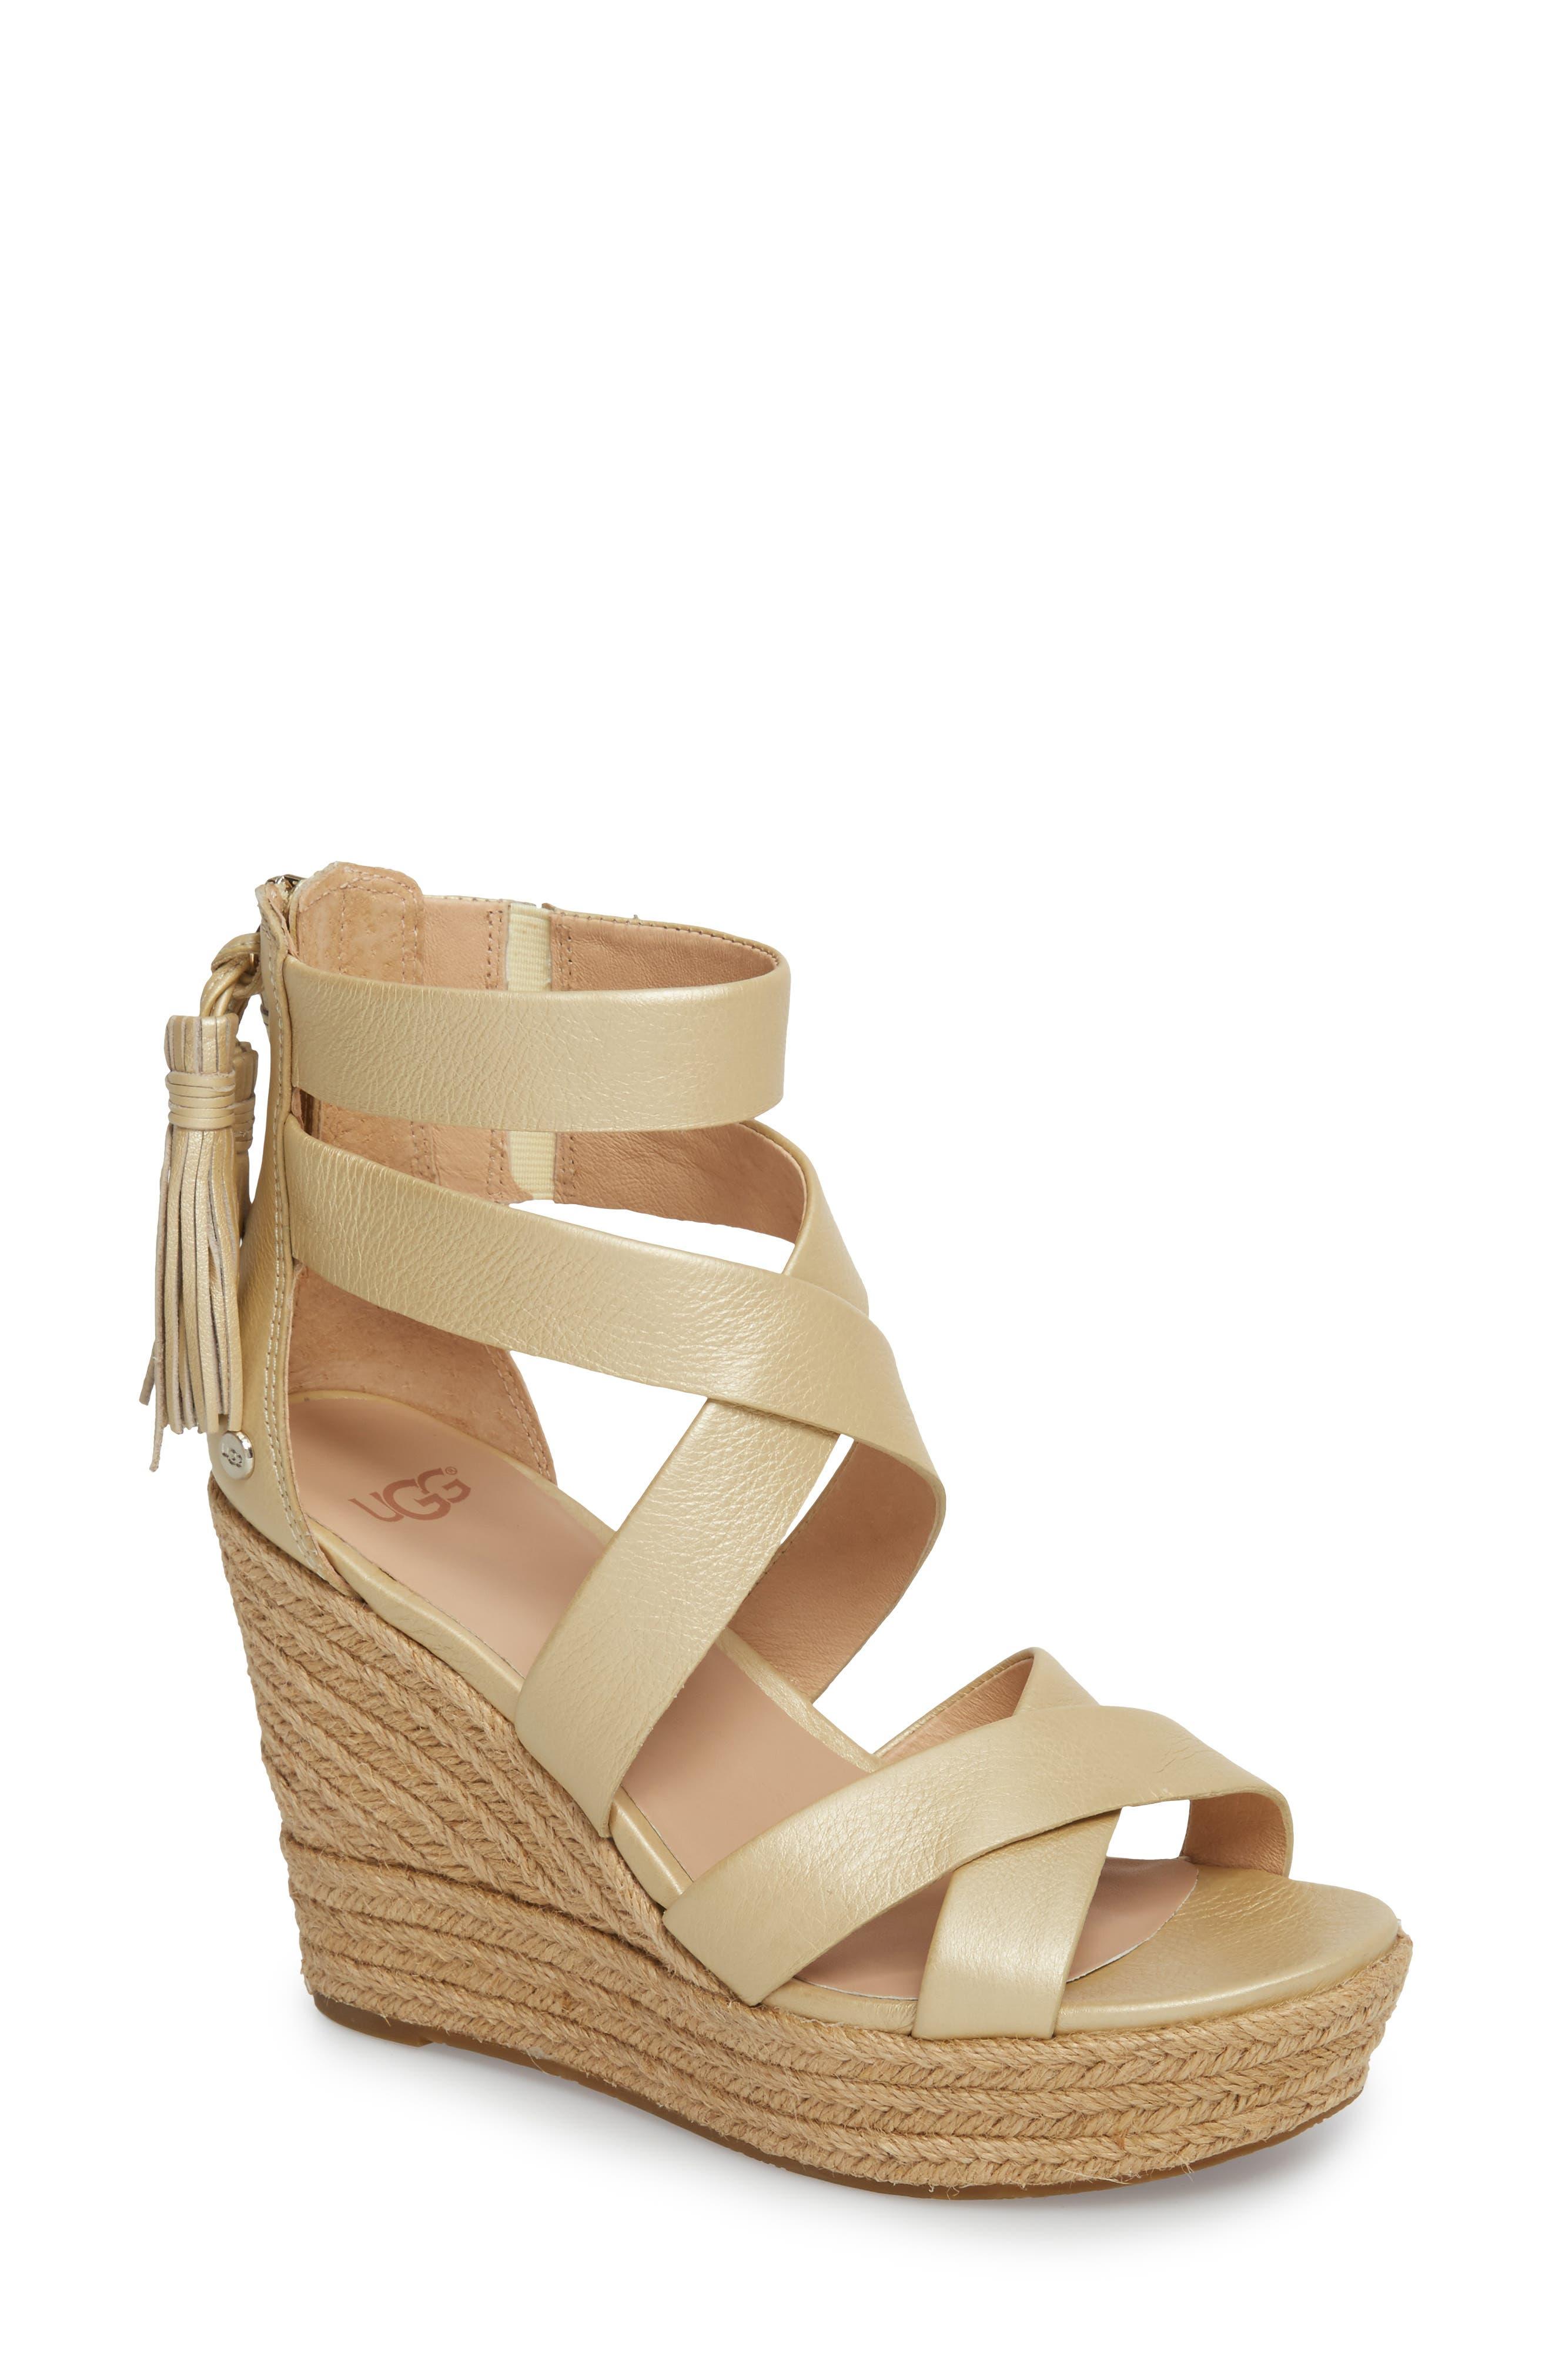 Raquel Platform Wedge Sandal,                         Main,                         color, Soft Gold Leather